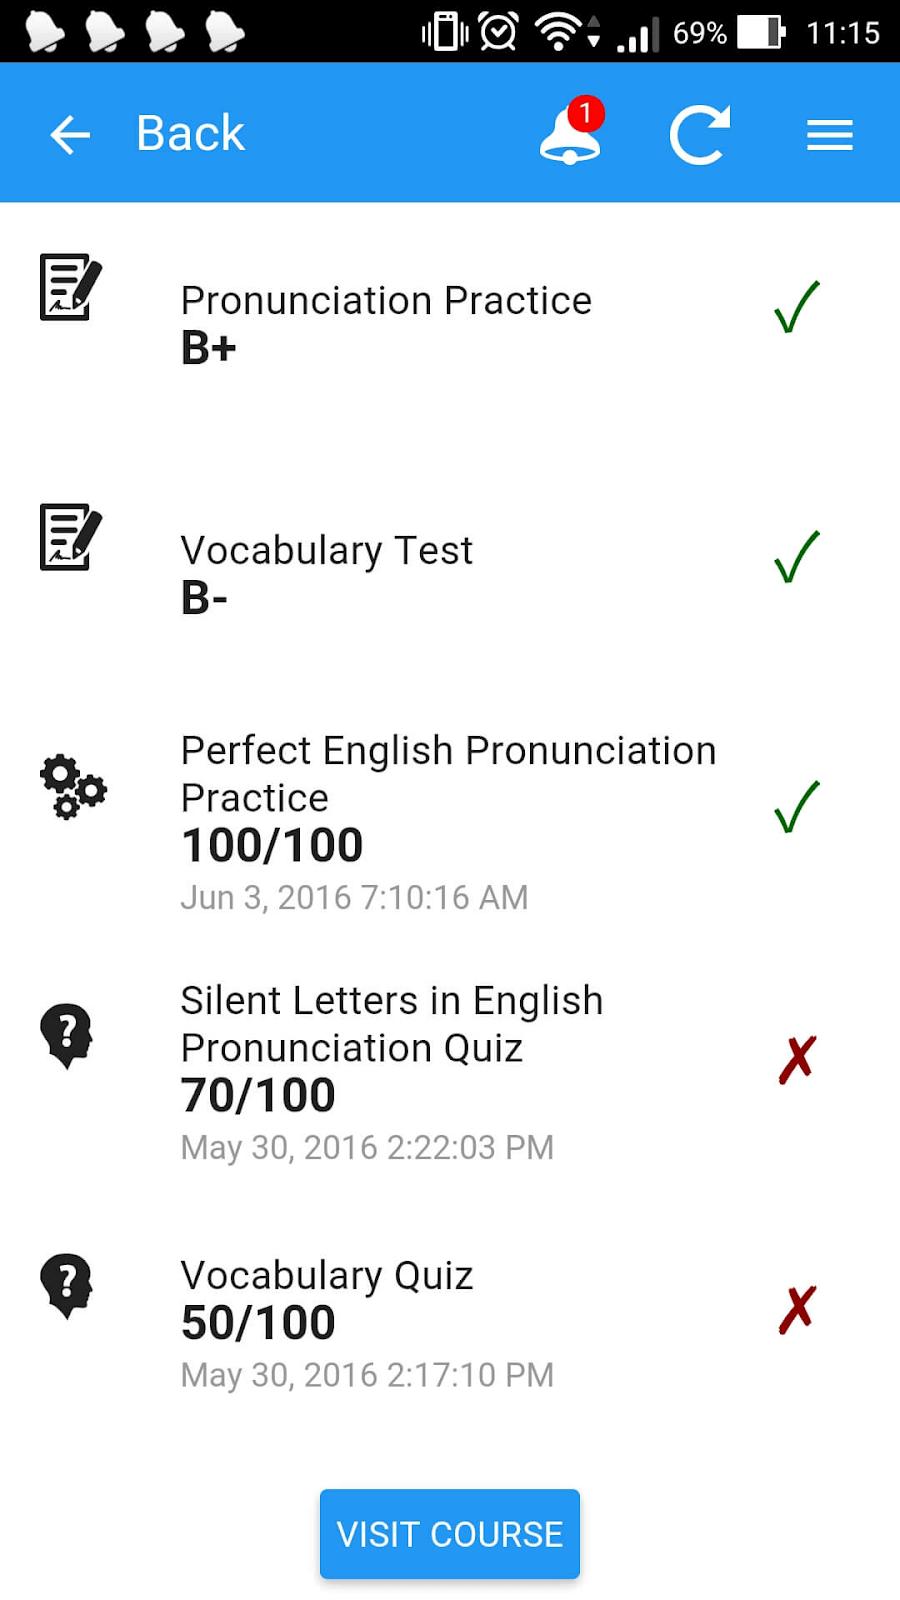 Gradebook in JoomlaLMS mobile app